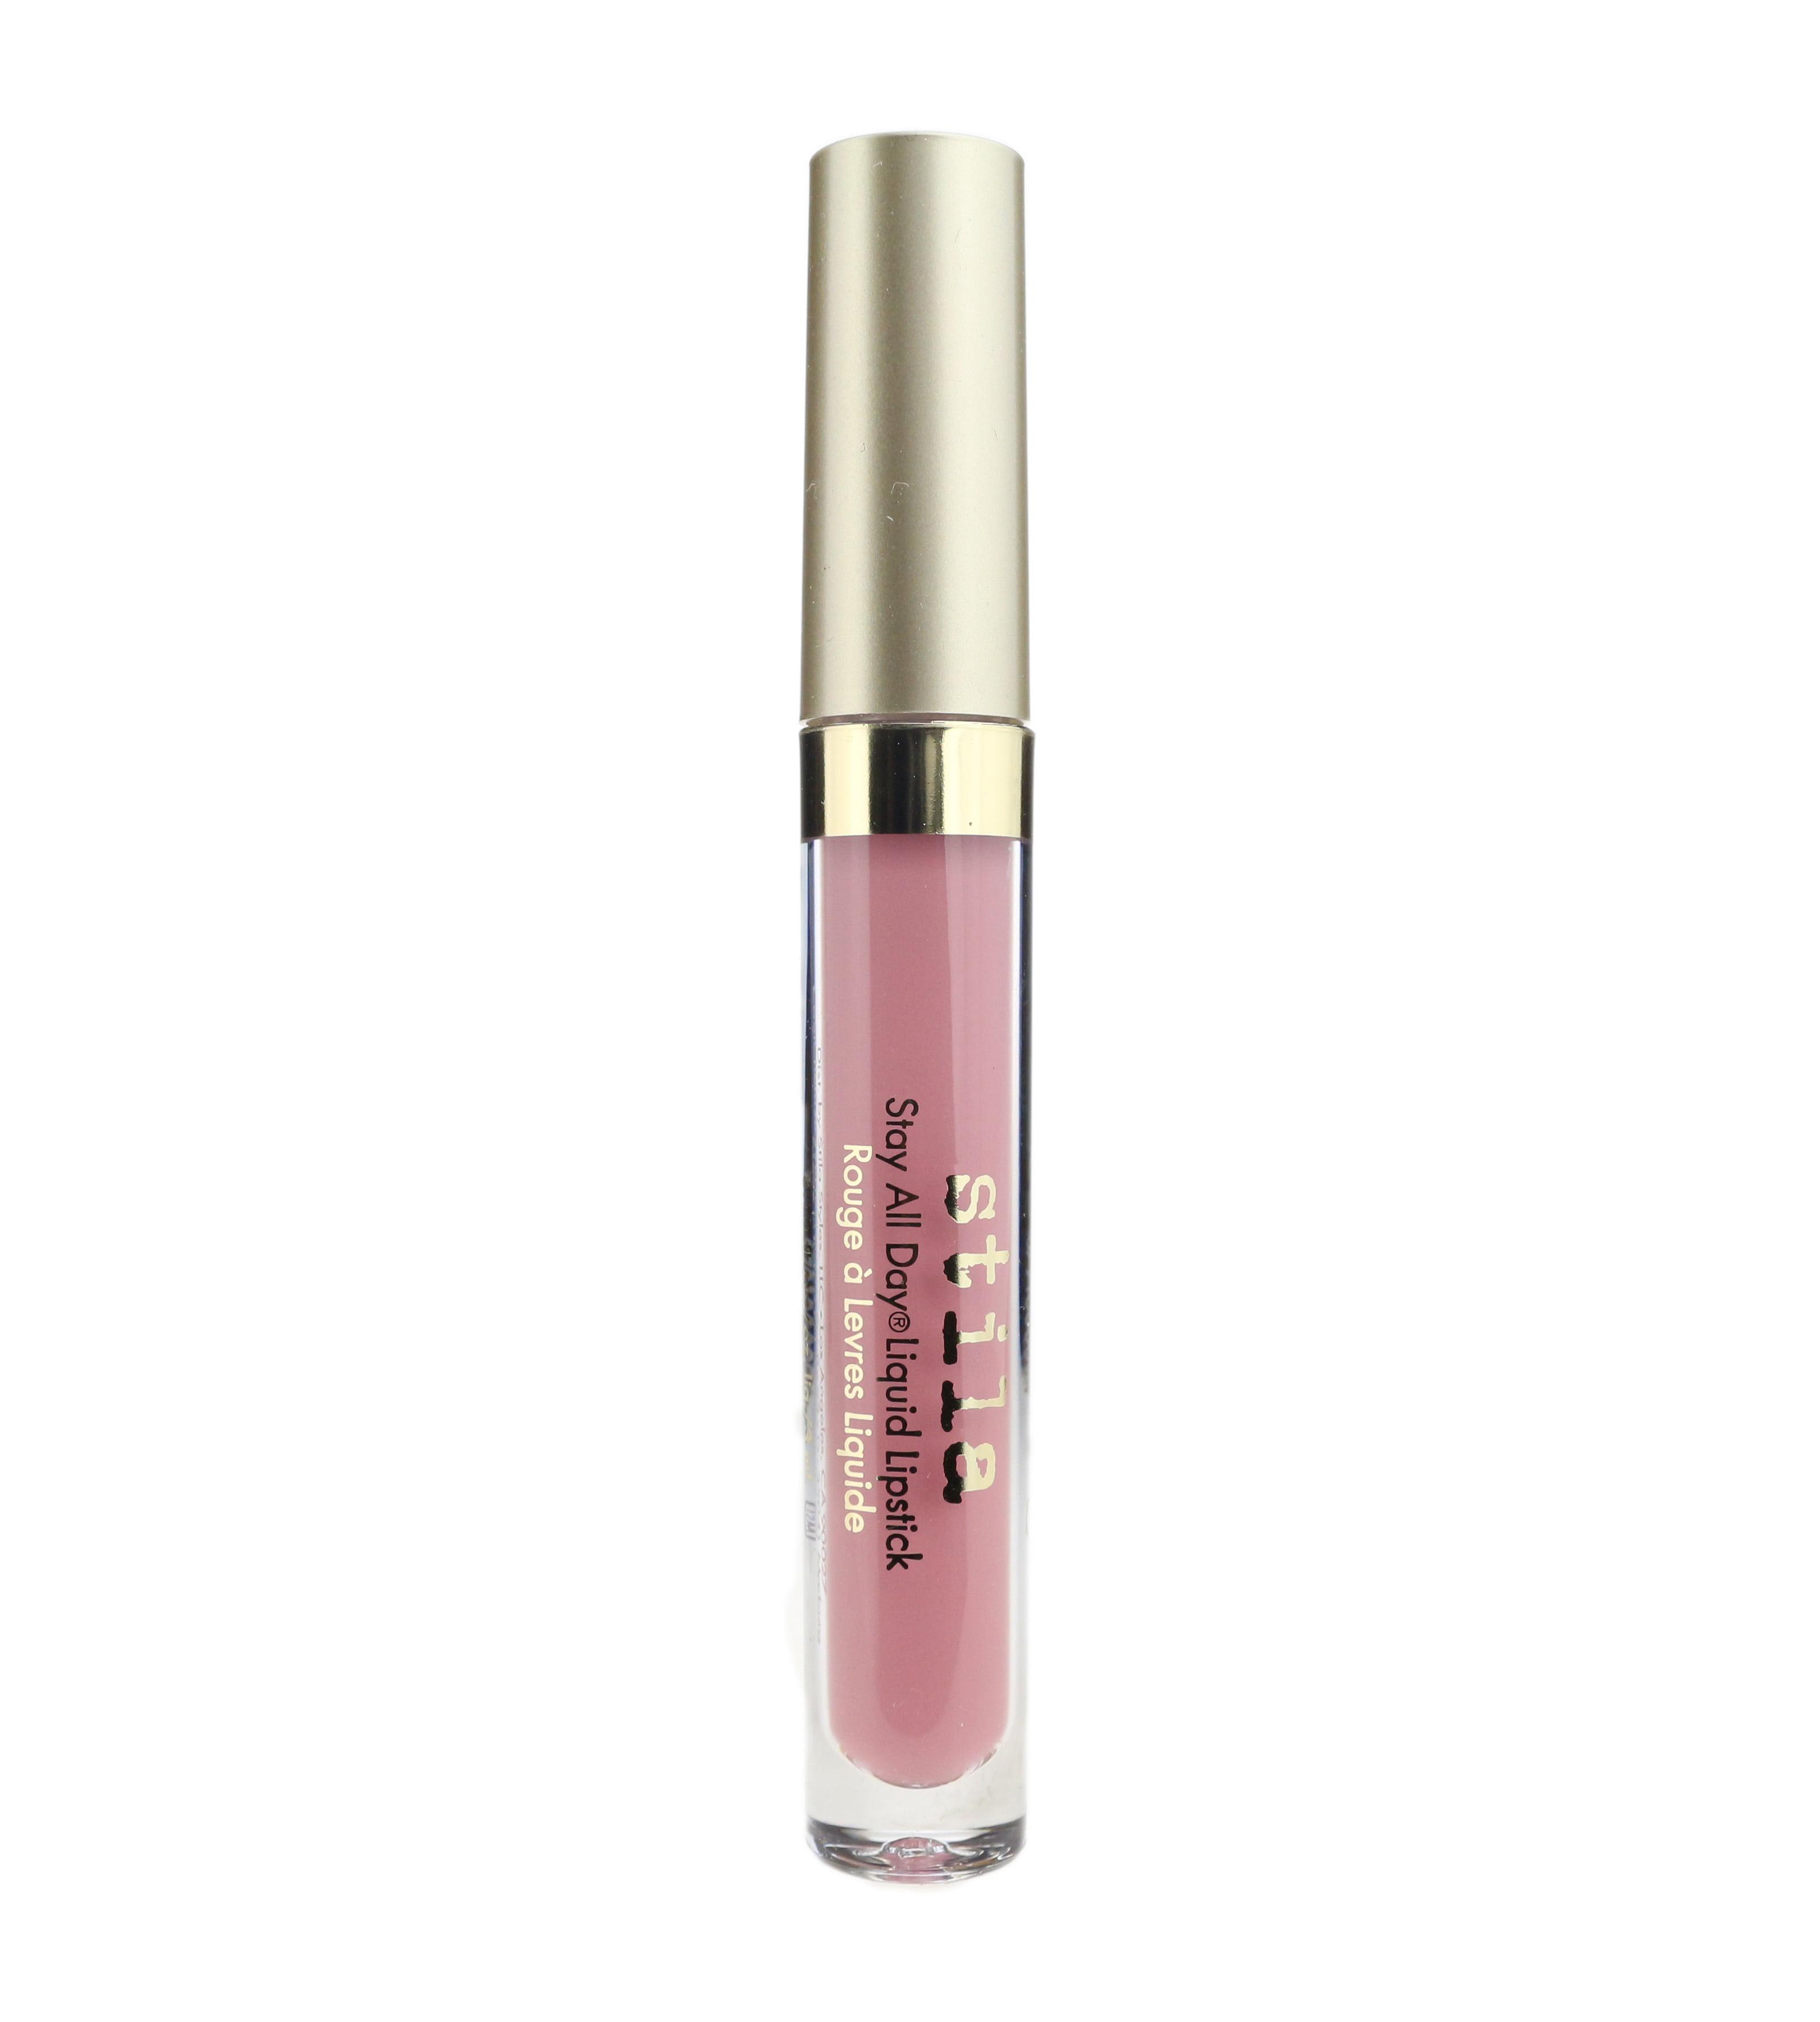 Stila Stay All Day Sheer Liquid Lipstick - Sheer Beso 0 1 oz Lipstick